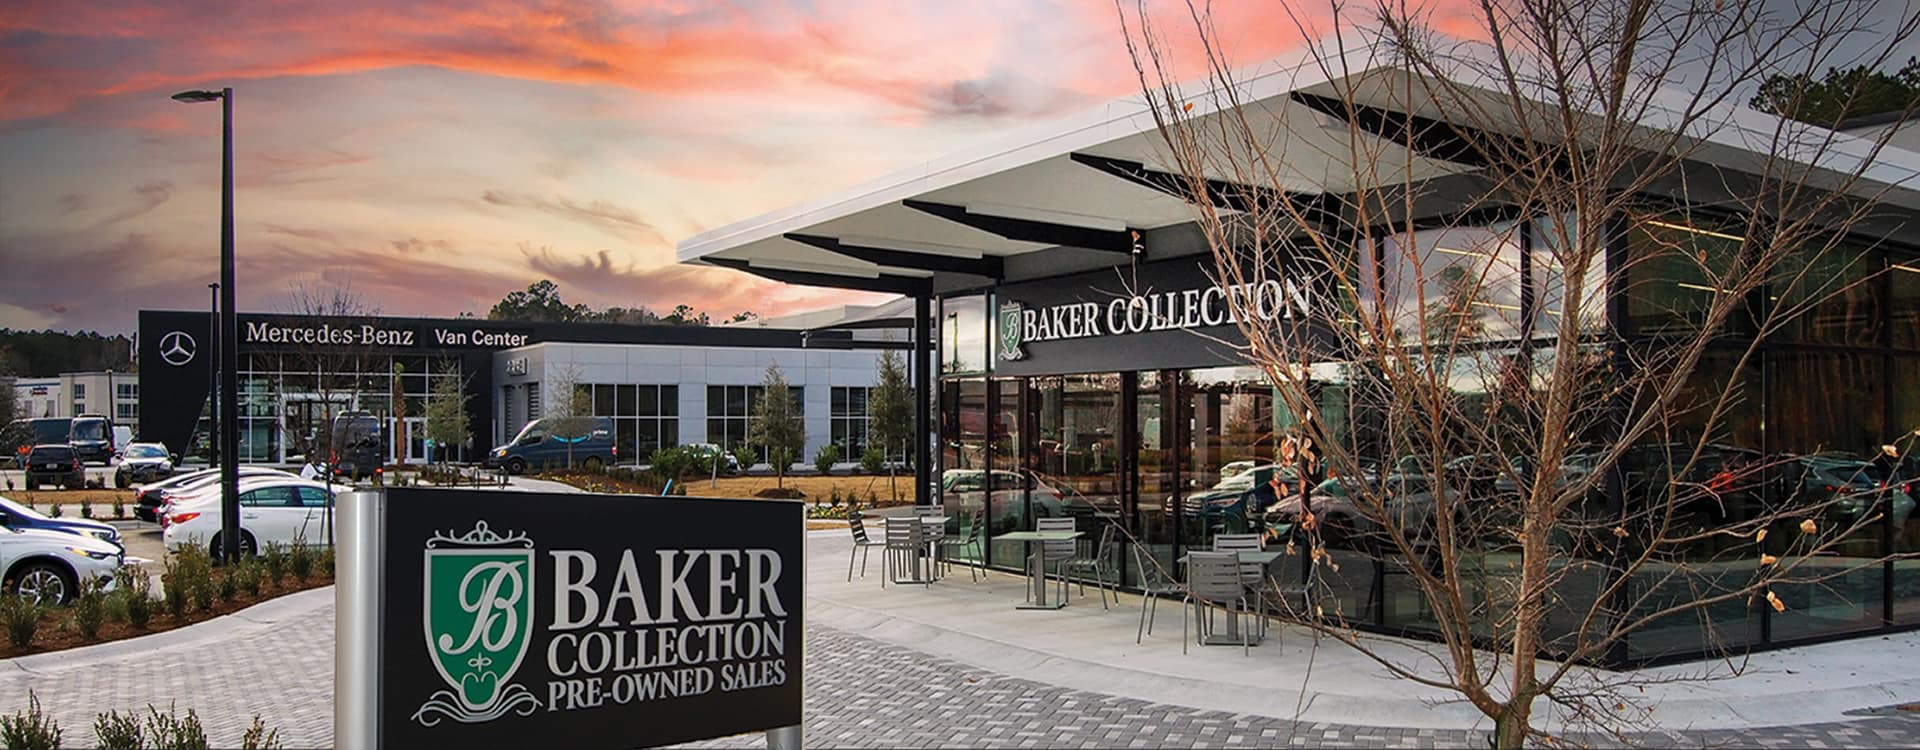 BAKER-COLLECTION-DEALER_1920x750